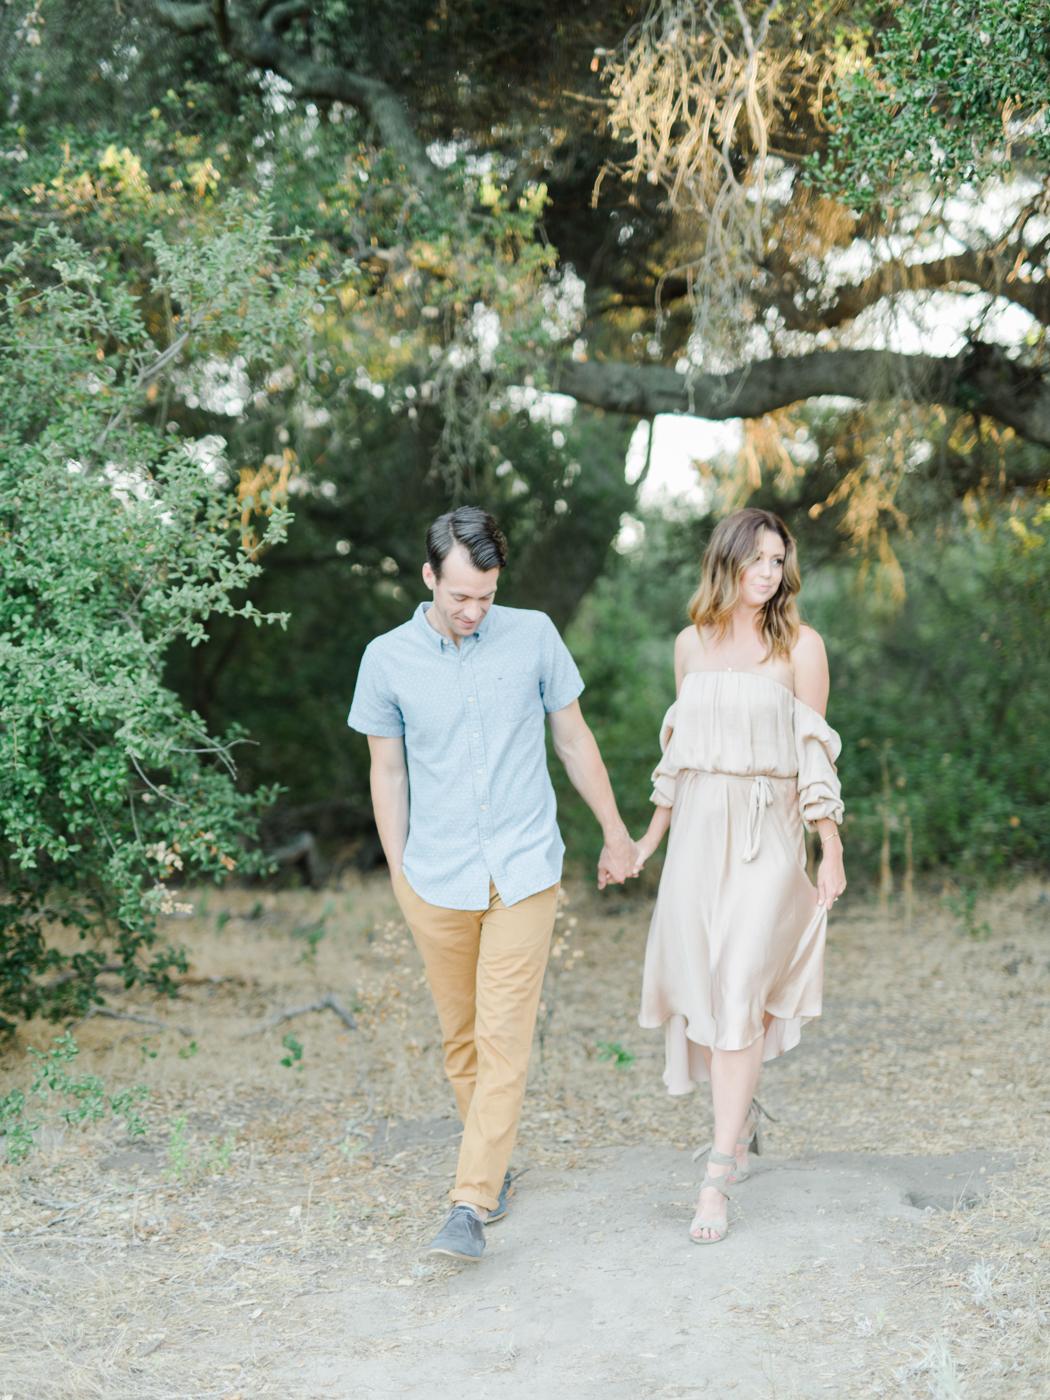 Malibu_Creek_State_Park_Romantic_Engagement_Session_C&J_romantic-11.jpg